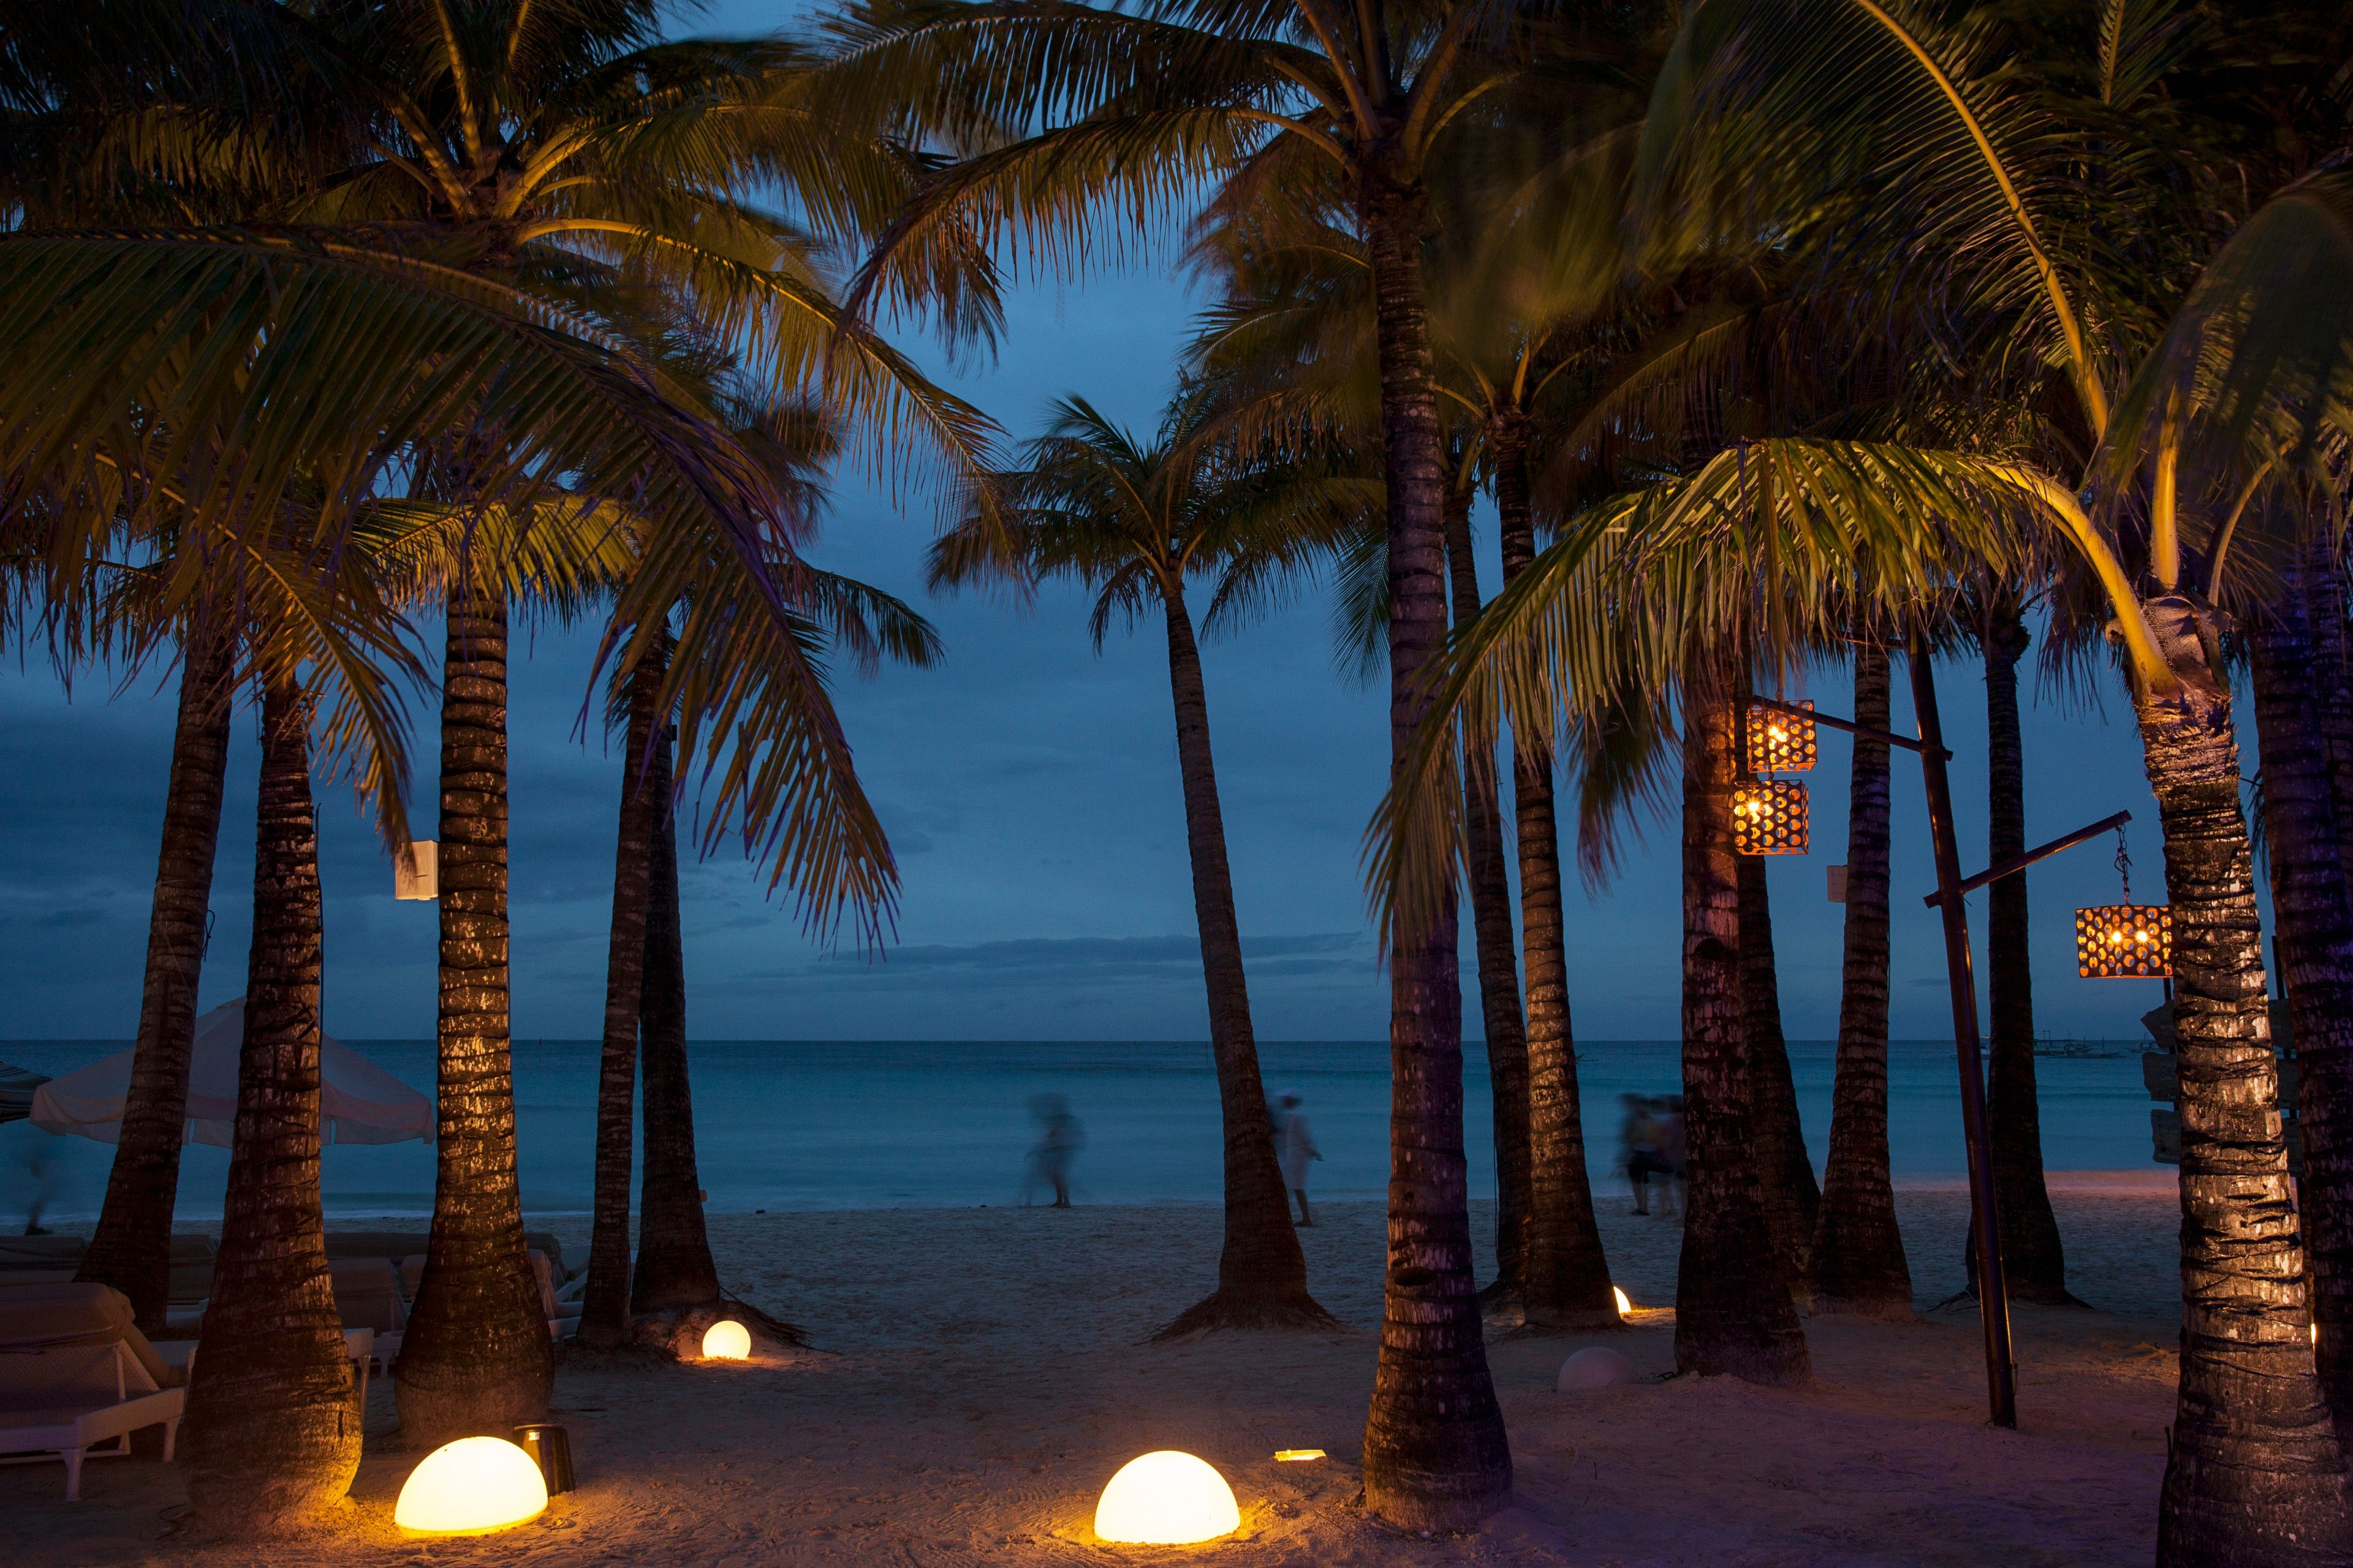 Landscape photo of the Boracay beachfront at night